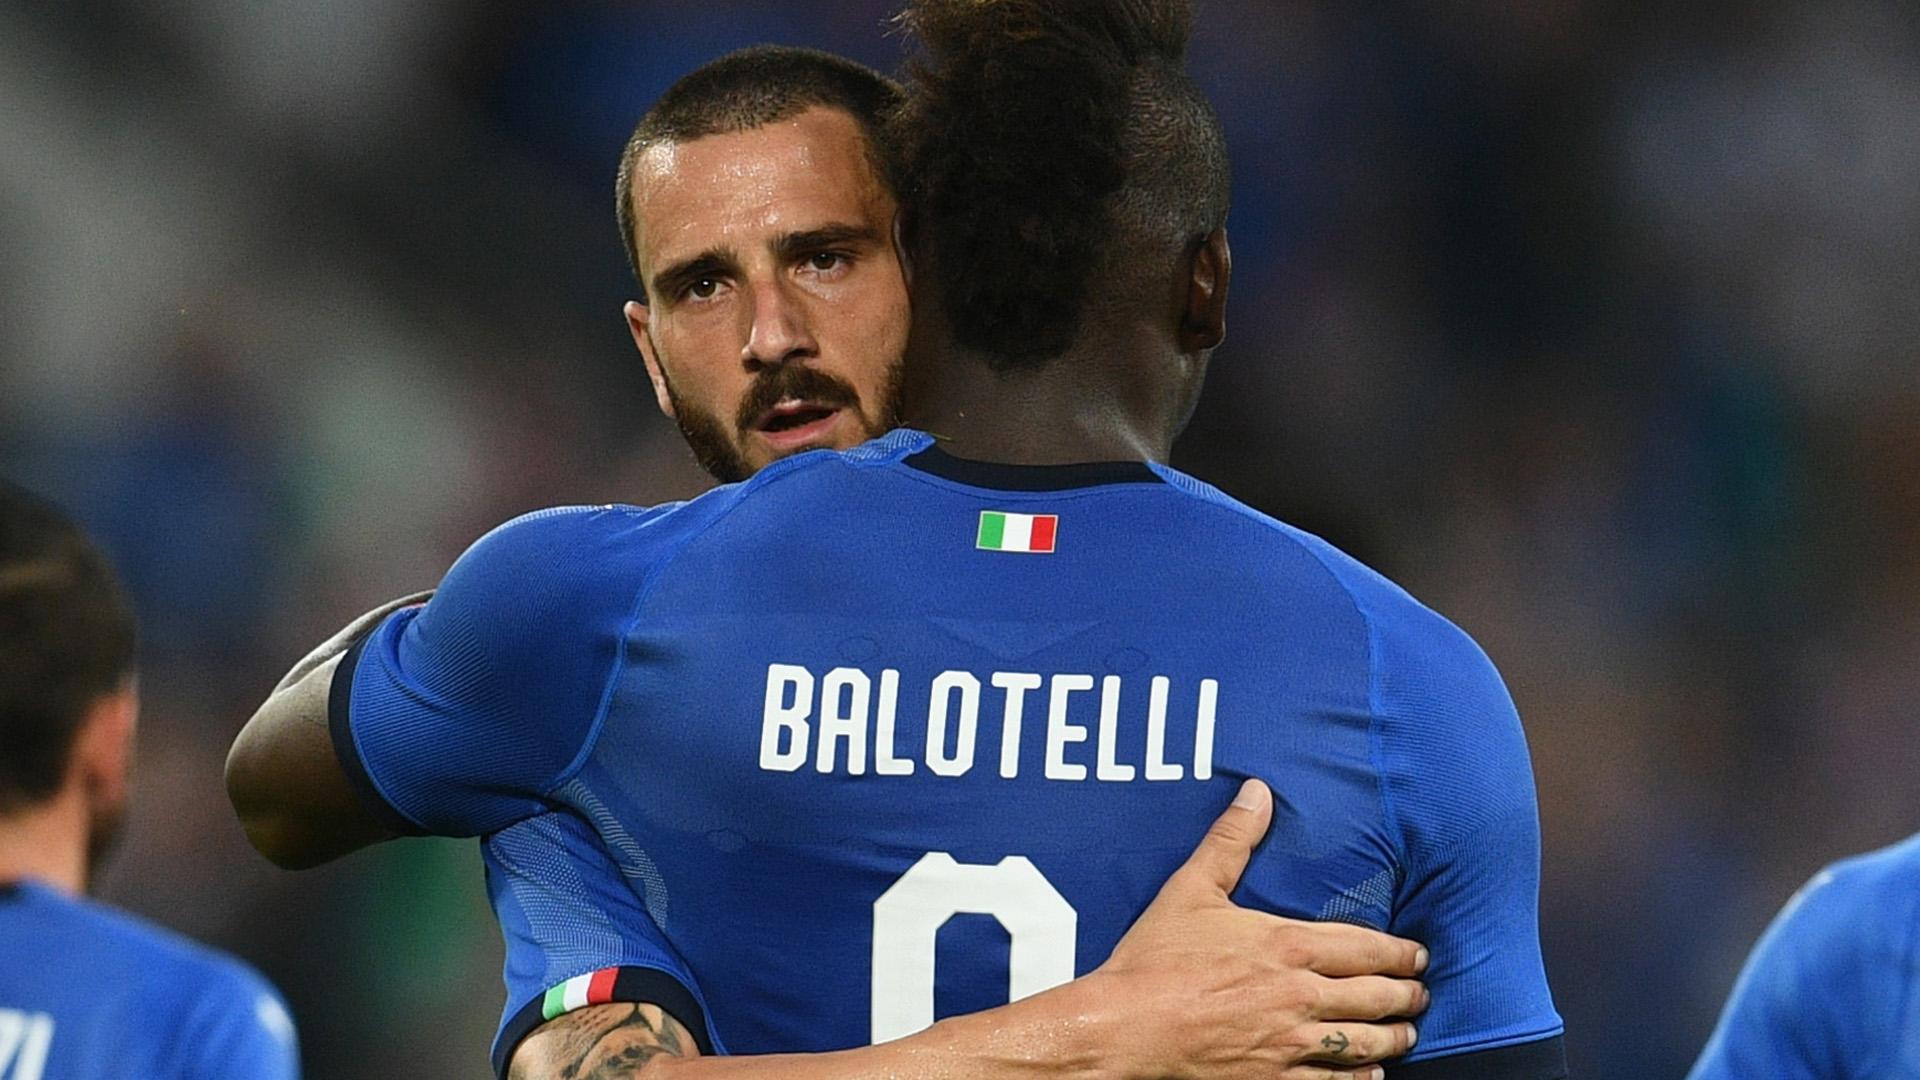 Bonucci Balotelli Italy